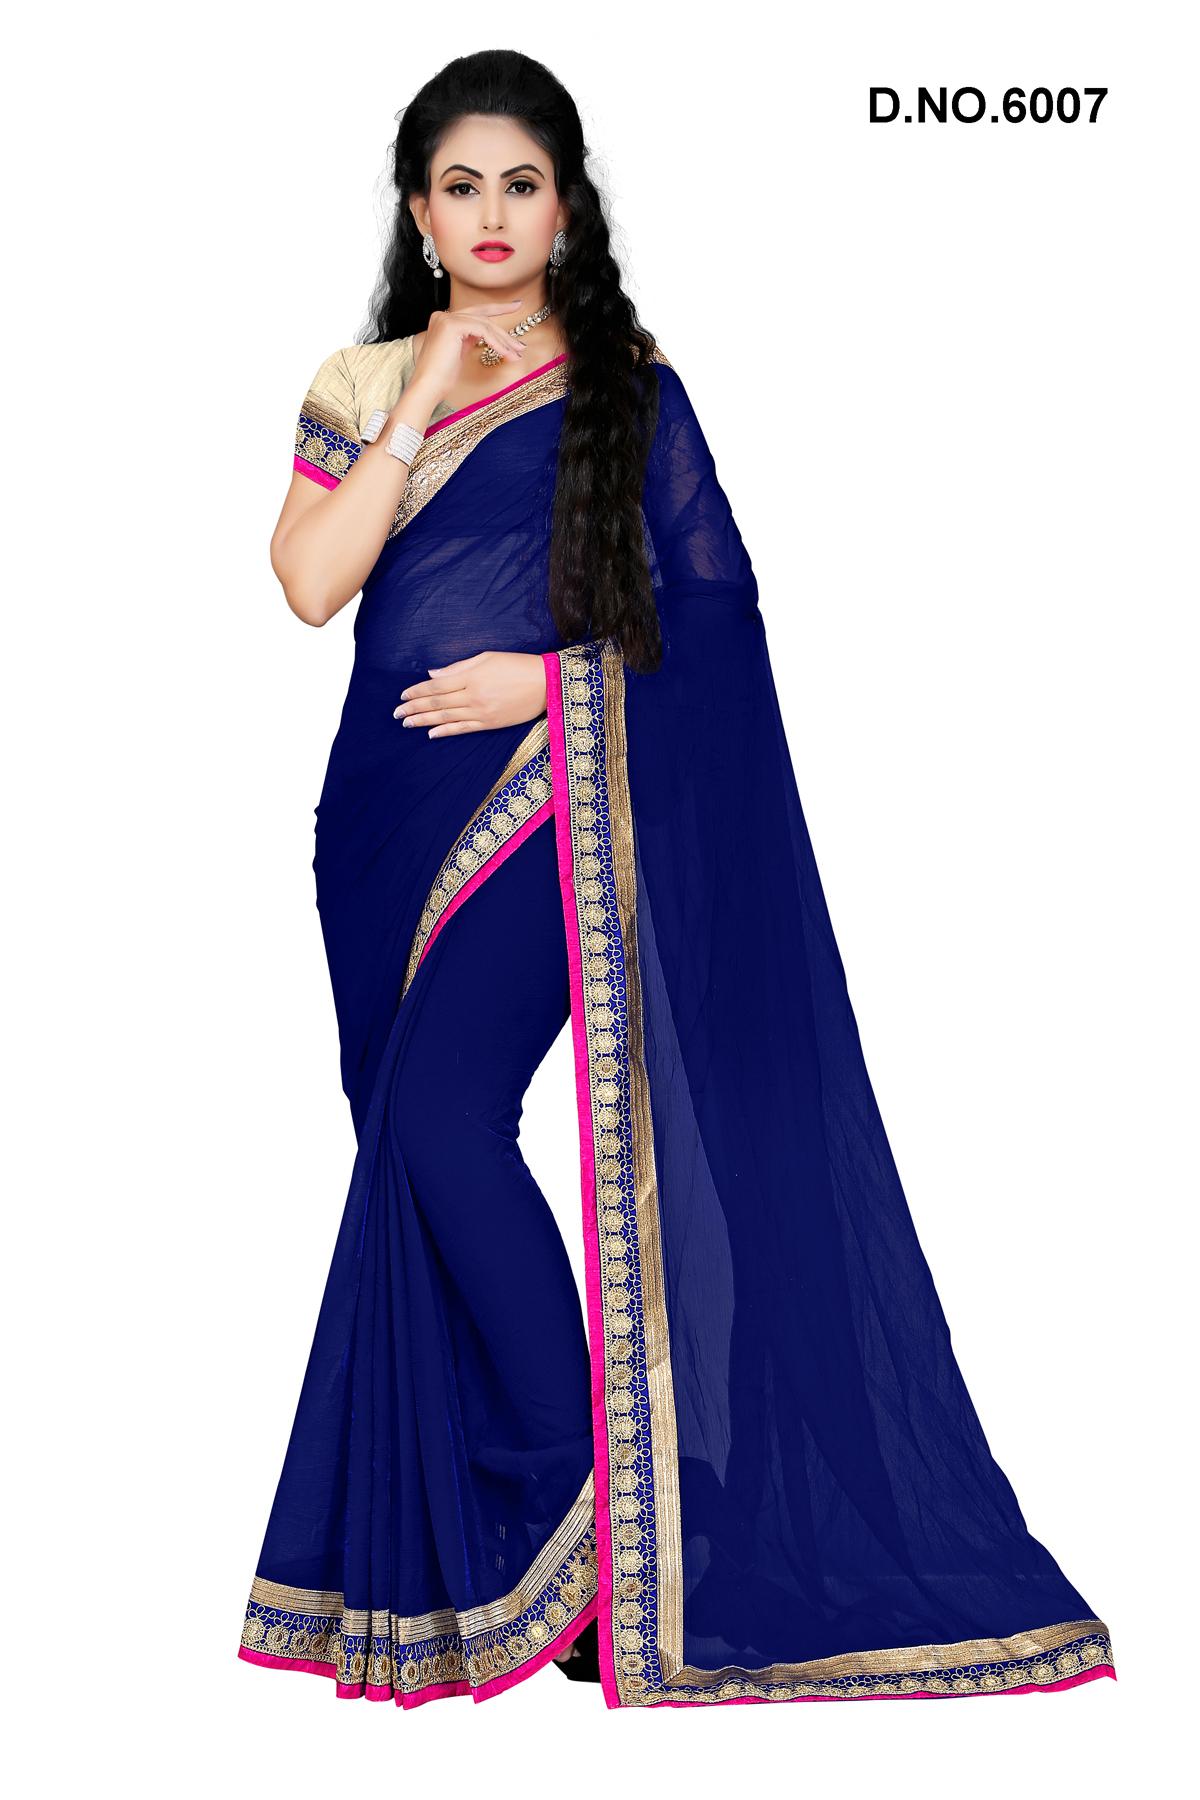 cf9cdece25 designer kurti online at best price,designer saree online shopping